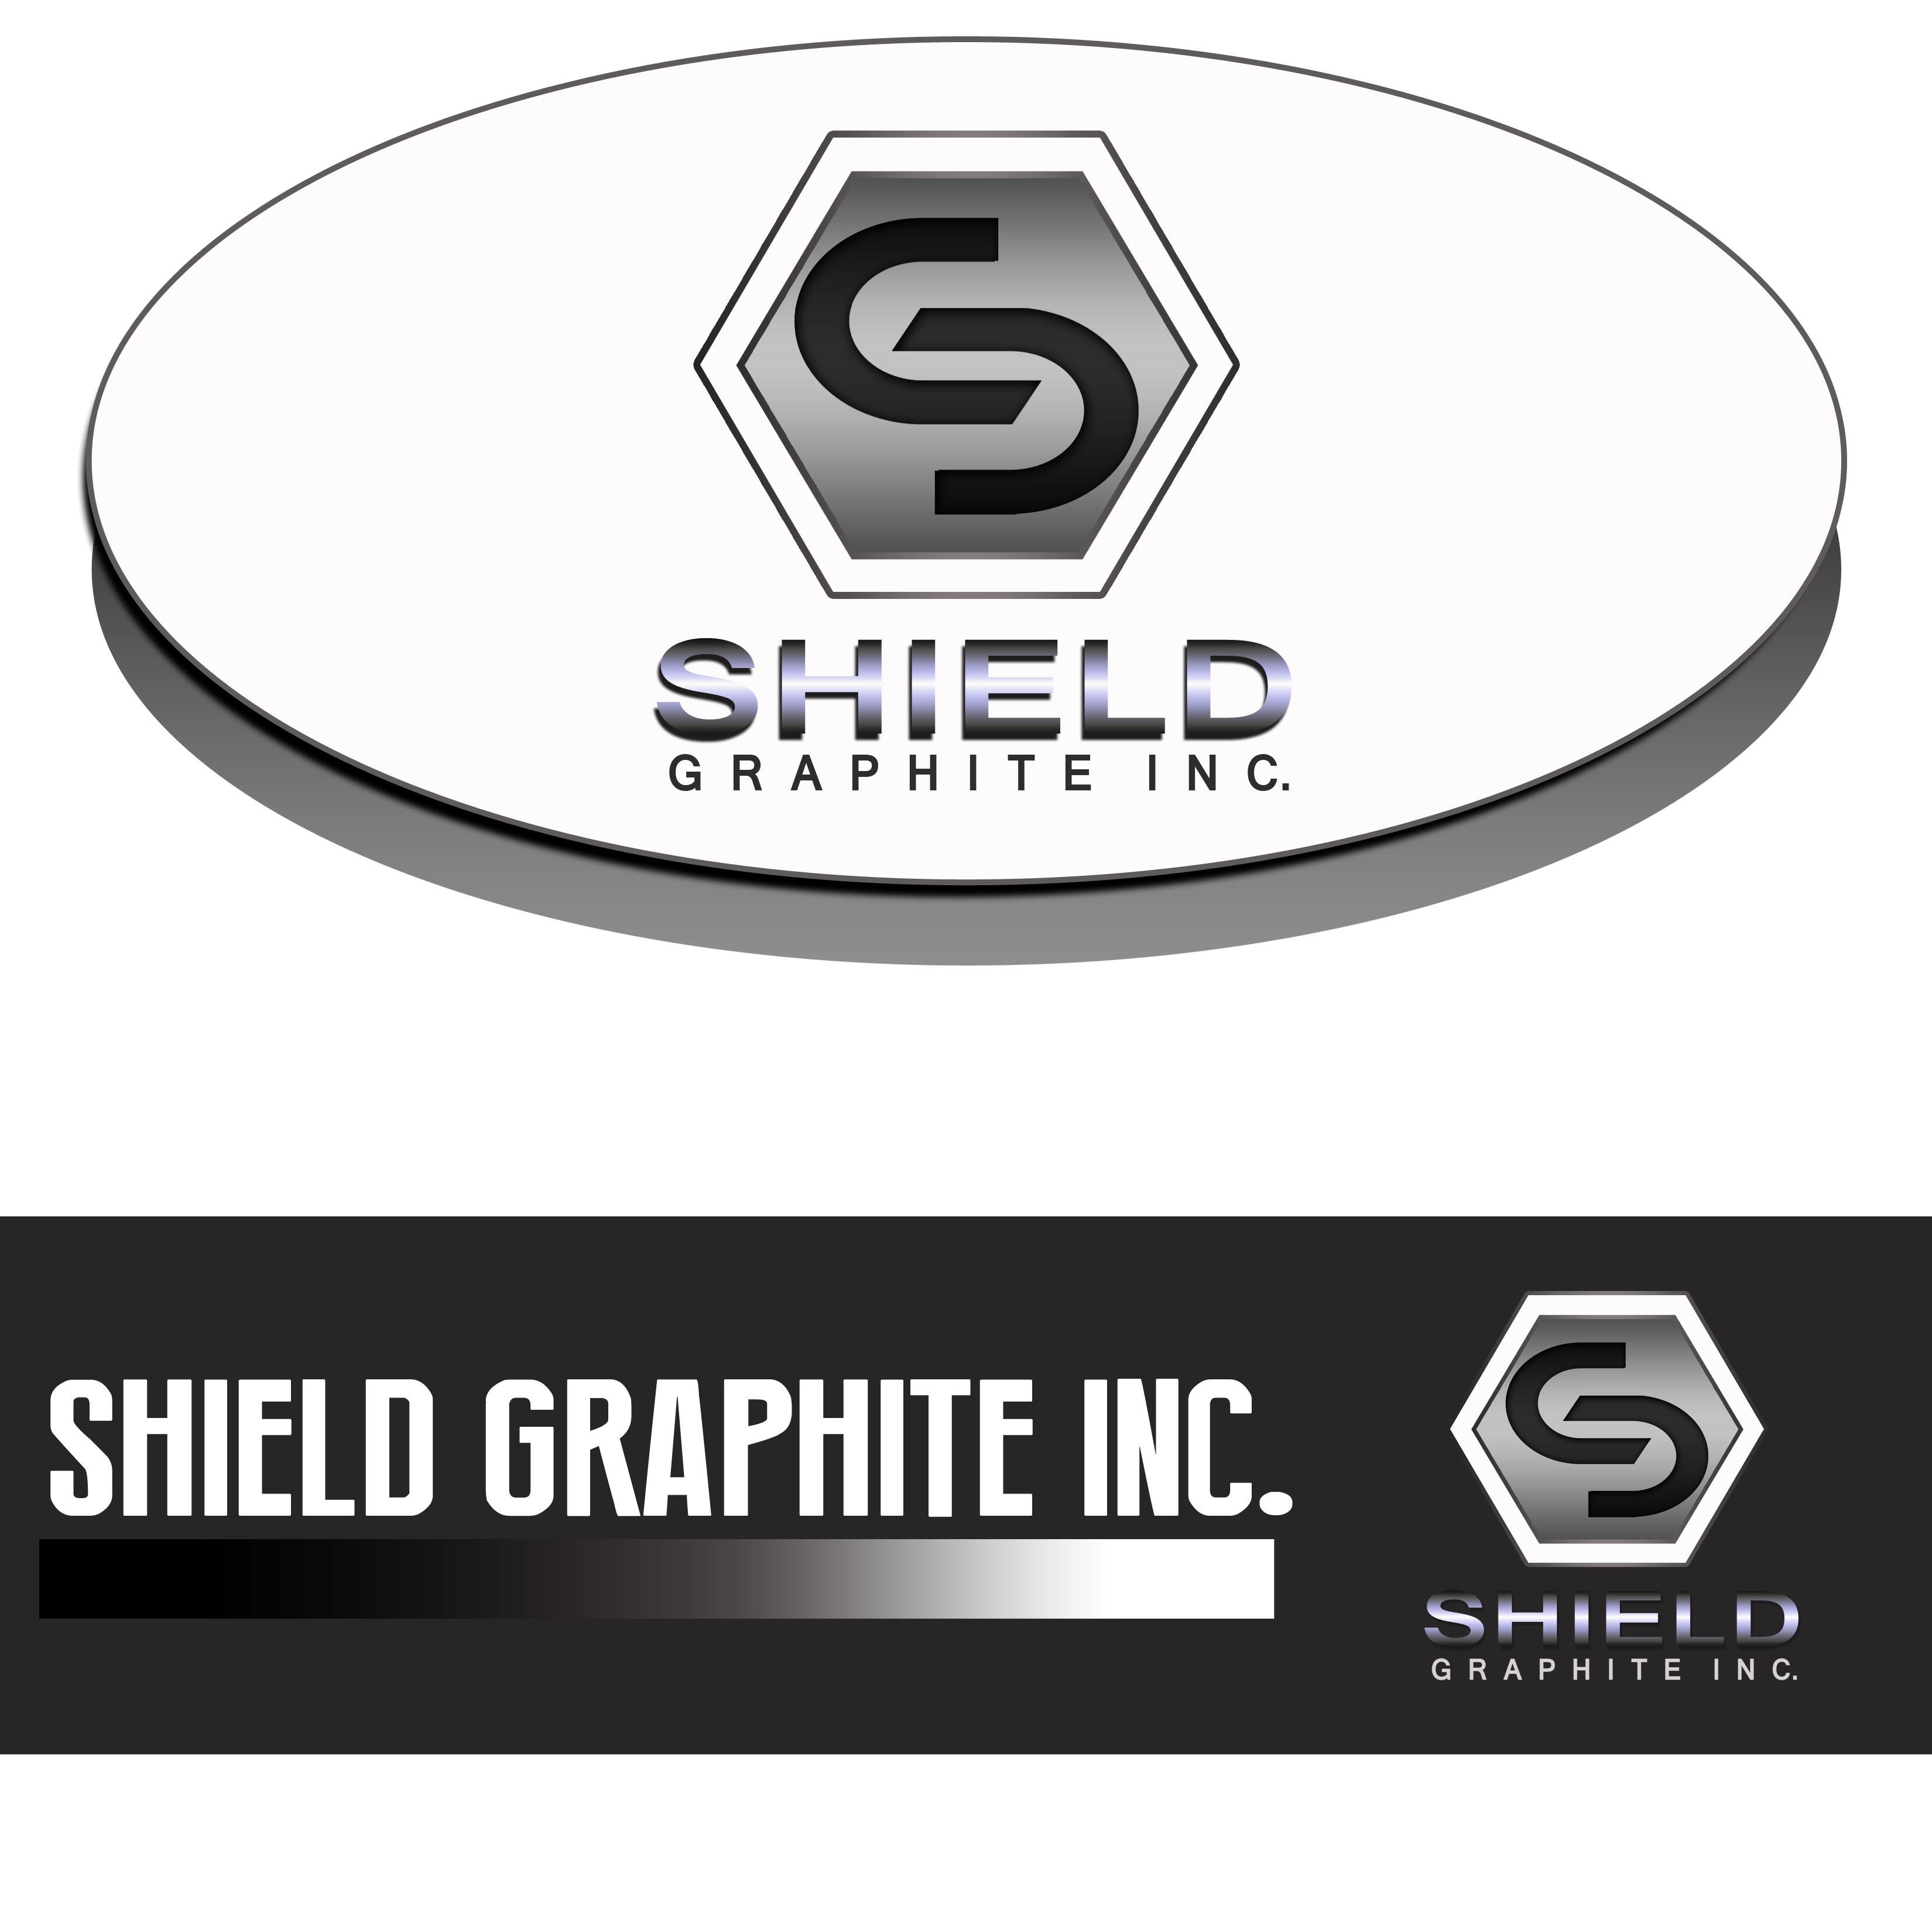 Logo Design by Allan Esclamado - Entry No. 40 in the Logo Design Contest Imaginative Logo Design for Shield Graphite Inc..